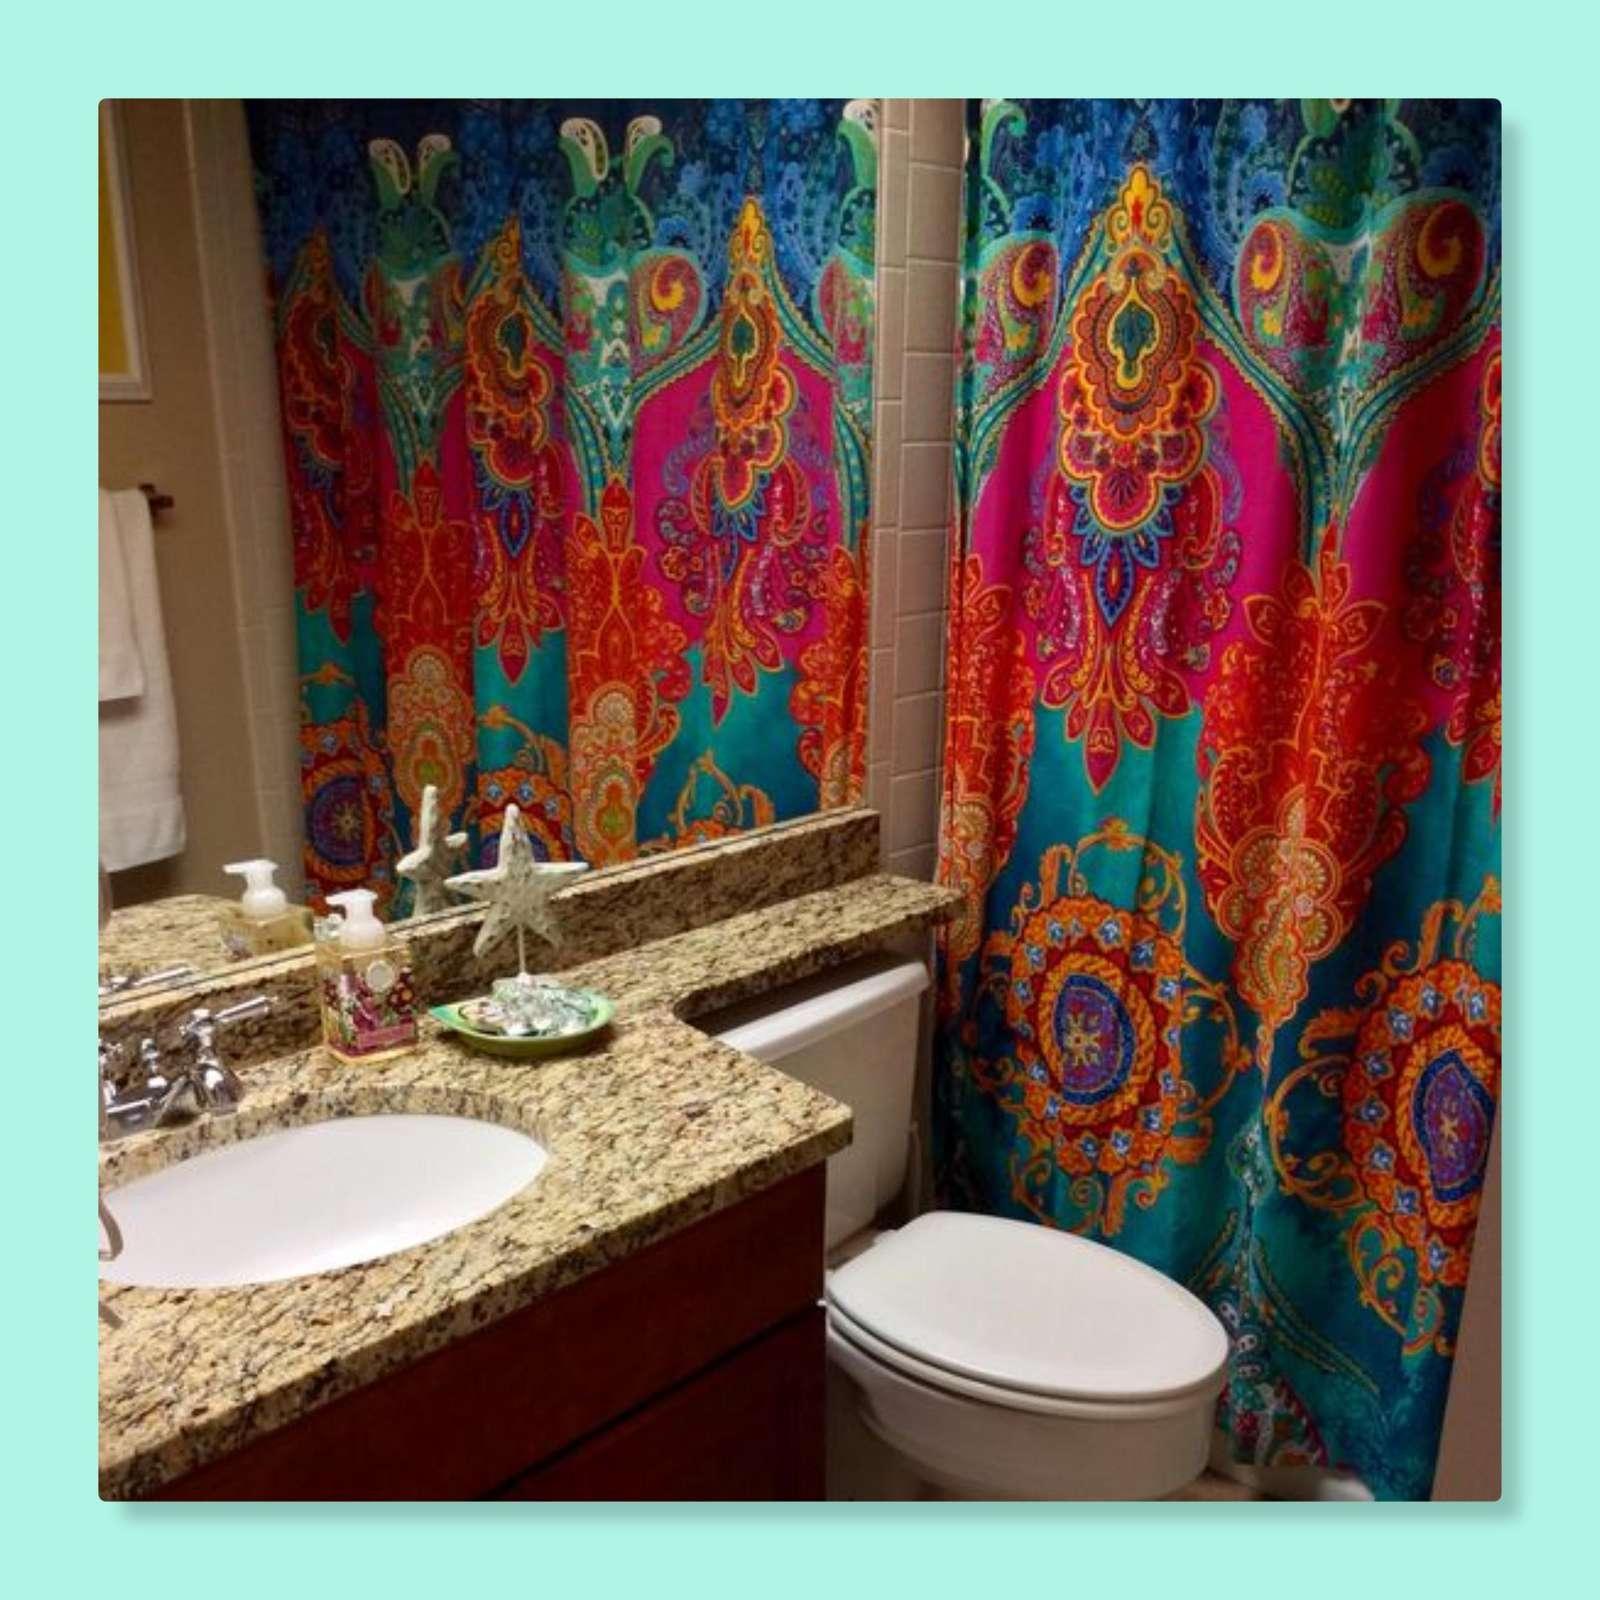 2nd bathroom has a tub/shower combination